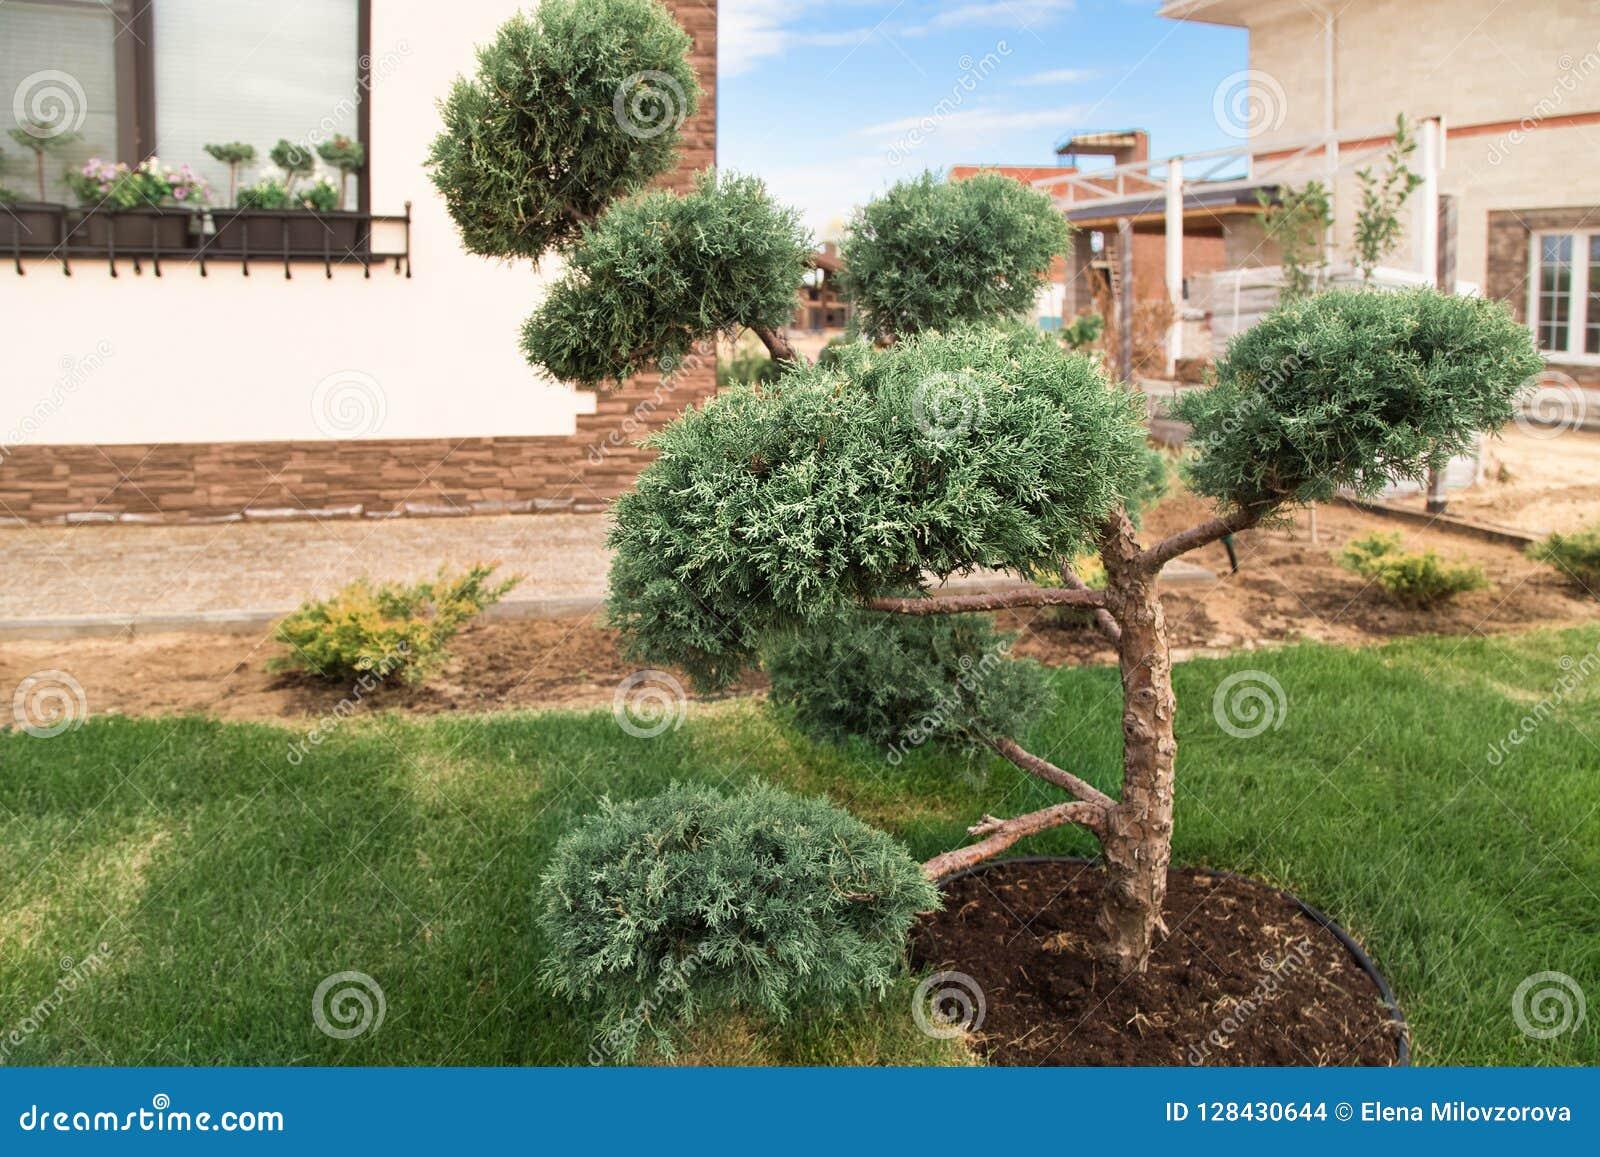 Cloud Pruned Topiary Tree Bonsai Tree Stock Photo Image Of